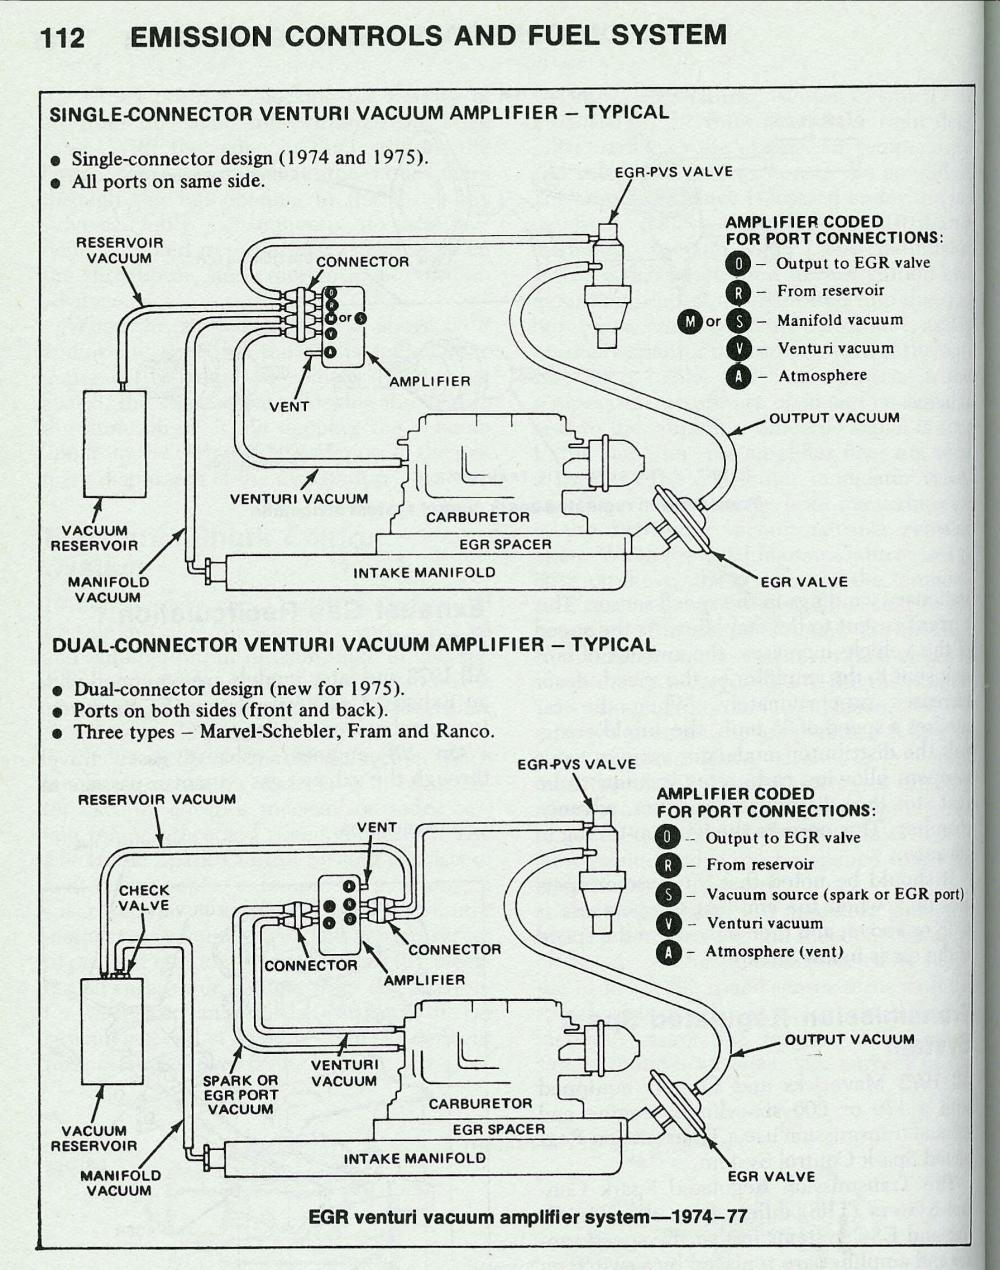 medium resolution of 115 1979 mercury chrysler outboard 1151h9a motor leg diagram and 115 1979 mercury chrysler outboard 1151h9a motor leg diagram and